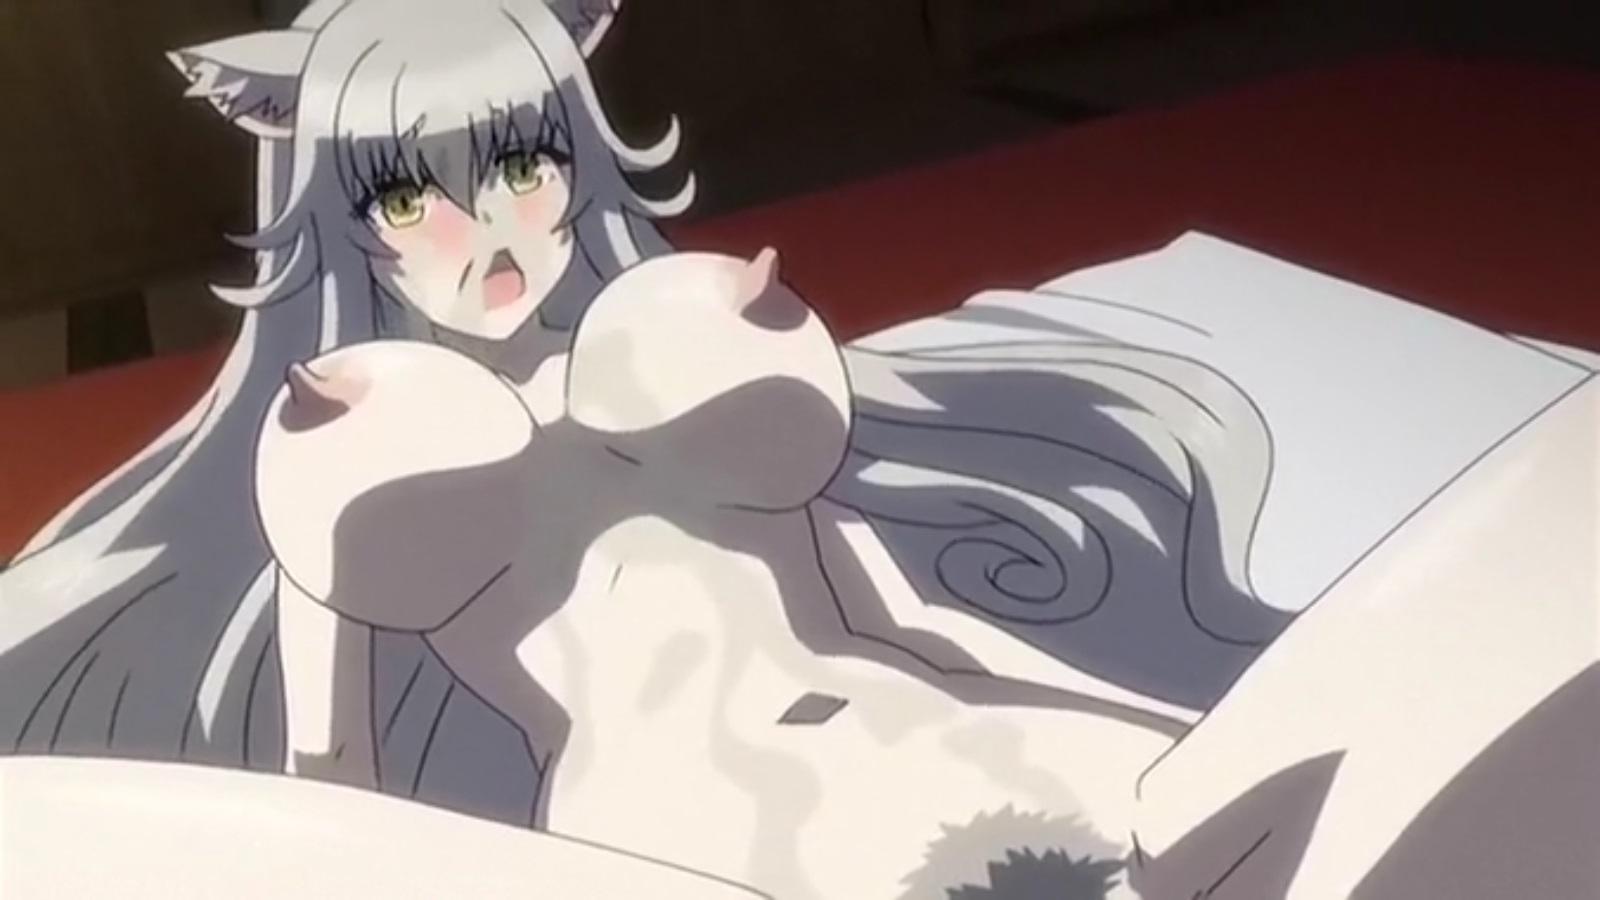 Japanese Anime Porn Hentai anime porn werefox blonde girl ginko | watchanime.video